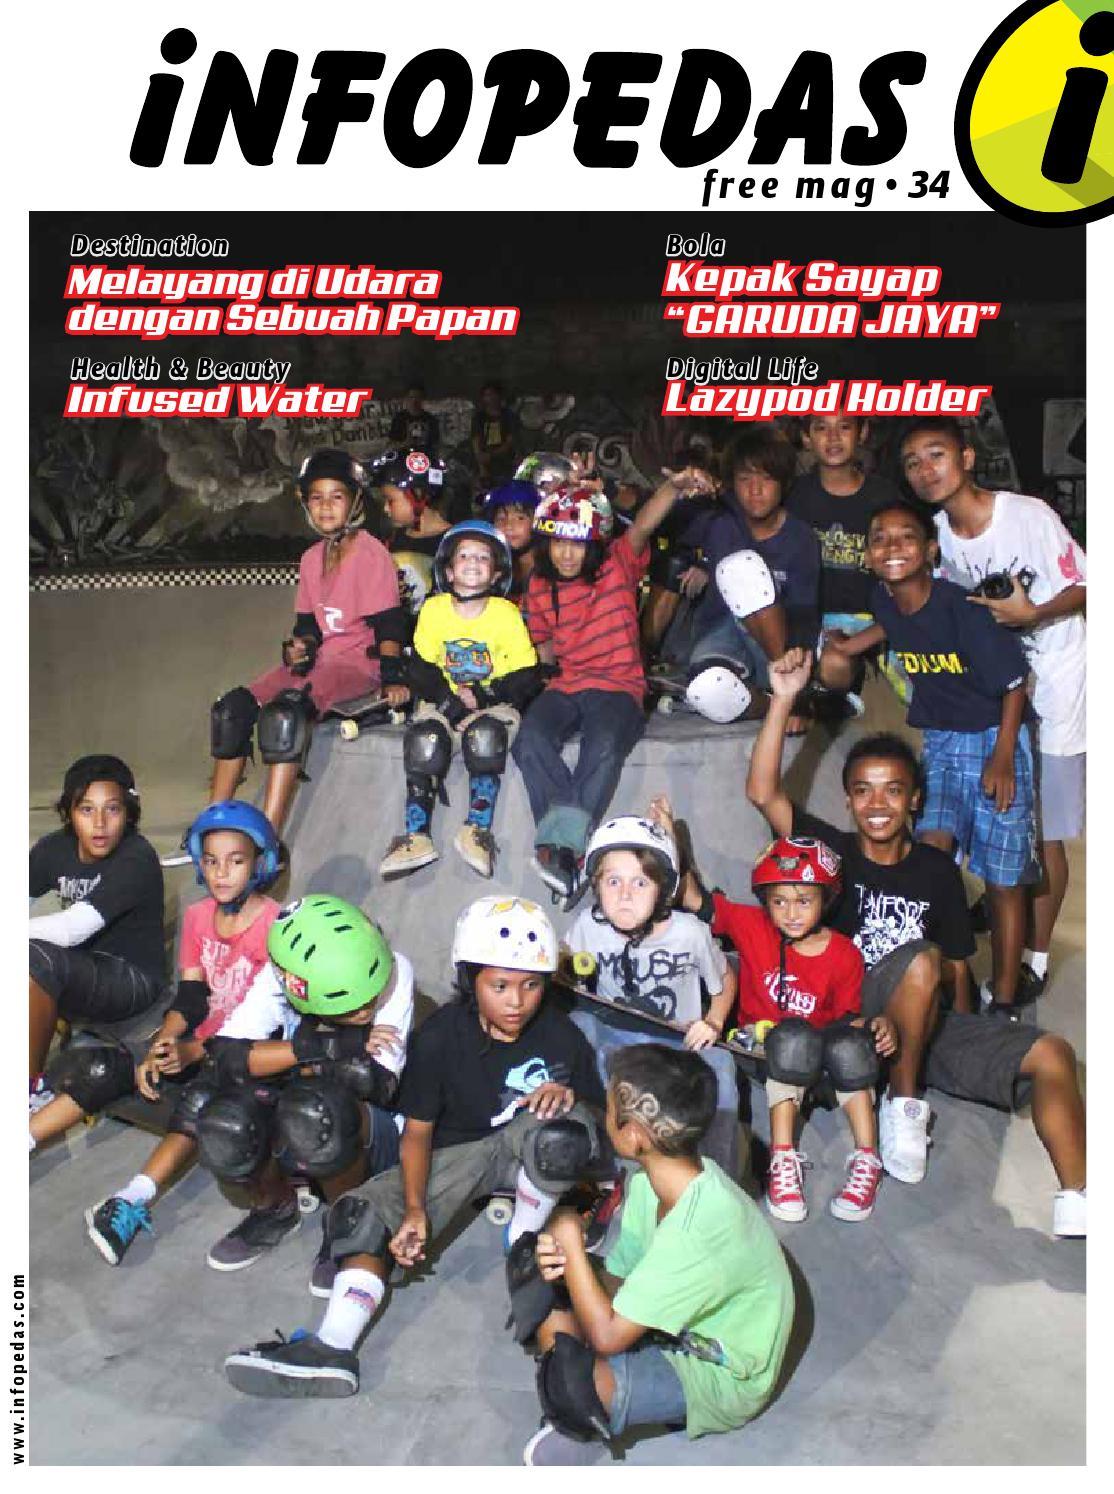 Majalah Infopedas Edisi 34 By Pedas Issuu Produk Ukm Bumn Sprei Waterproof Anti Ompol Motif